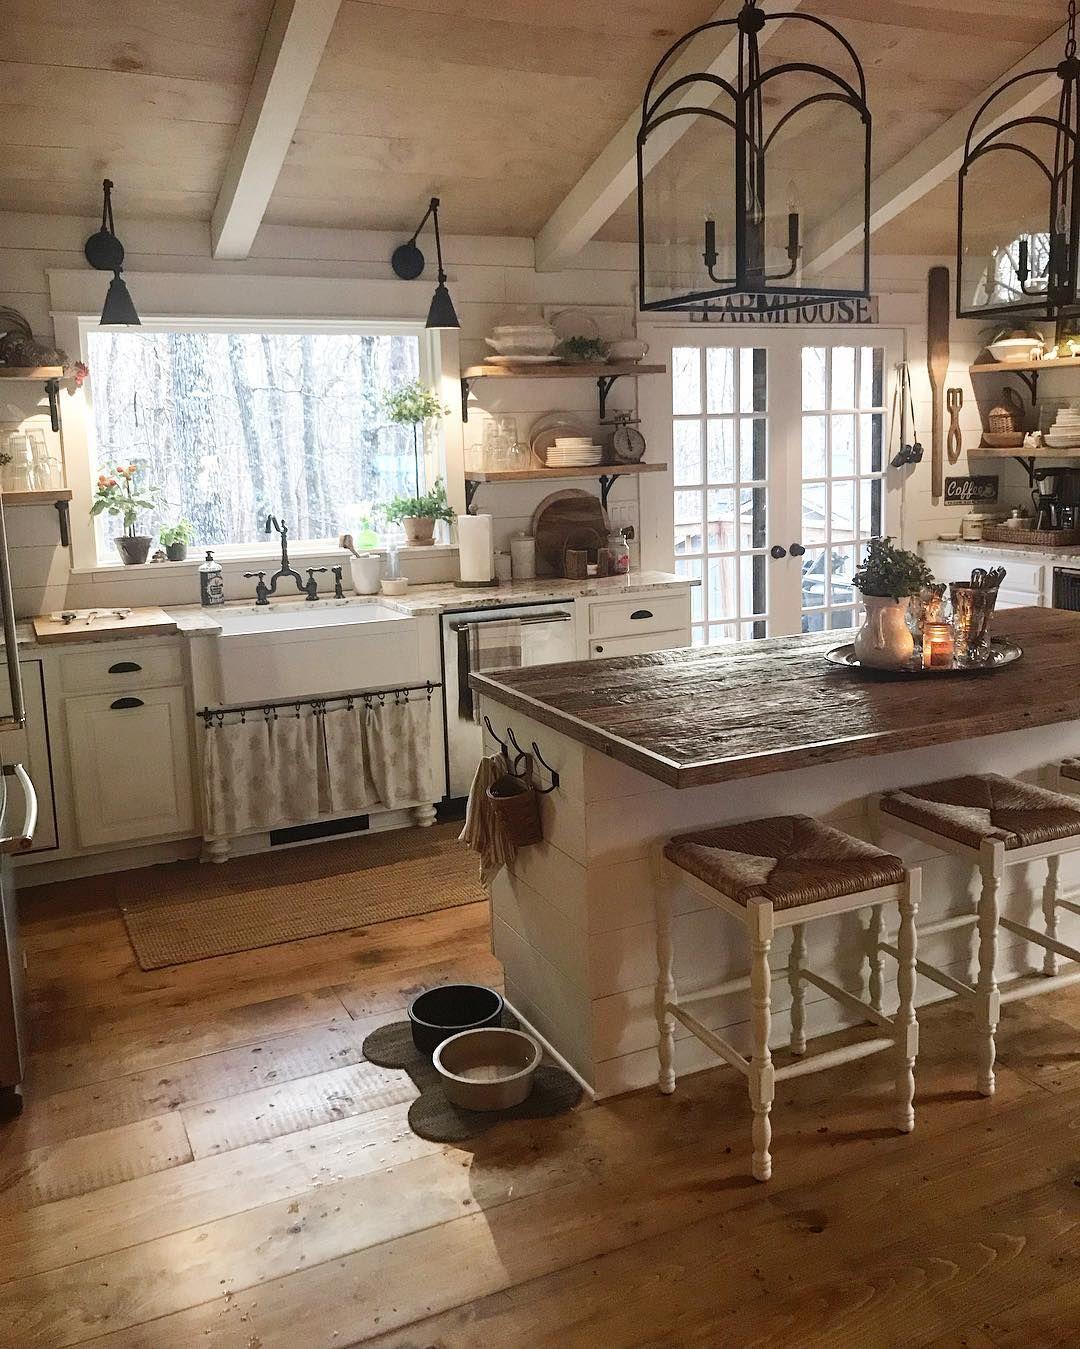 Photo of 15 Farmhouse Instagram Accounts to Follow For Endless Decor Inspiration